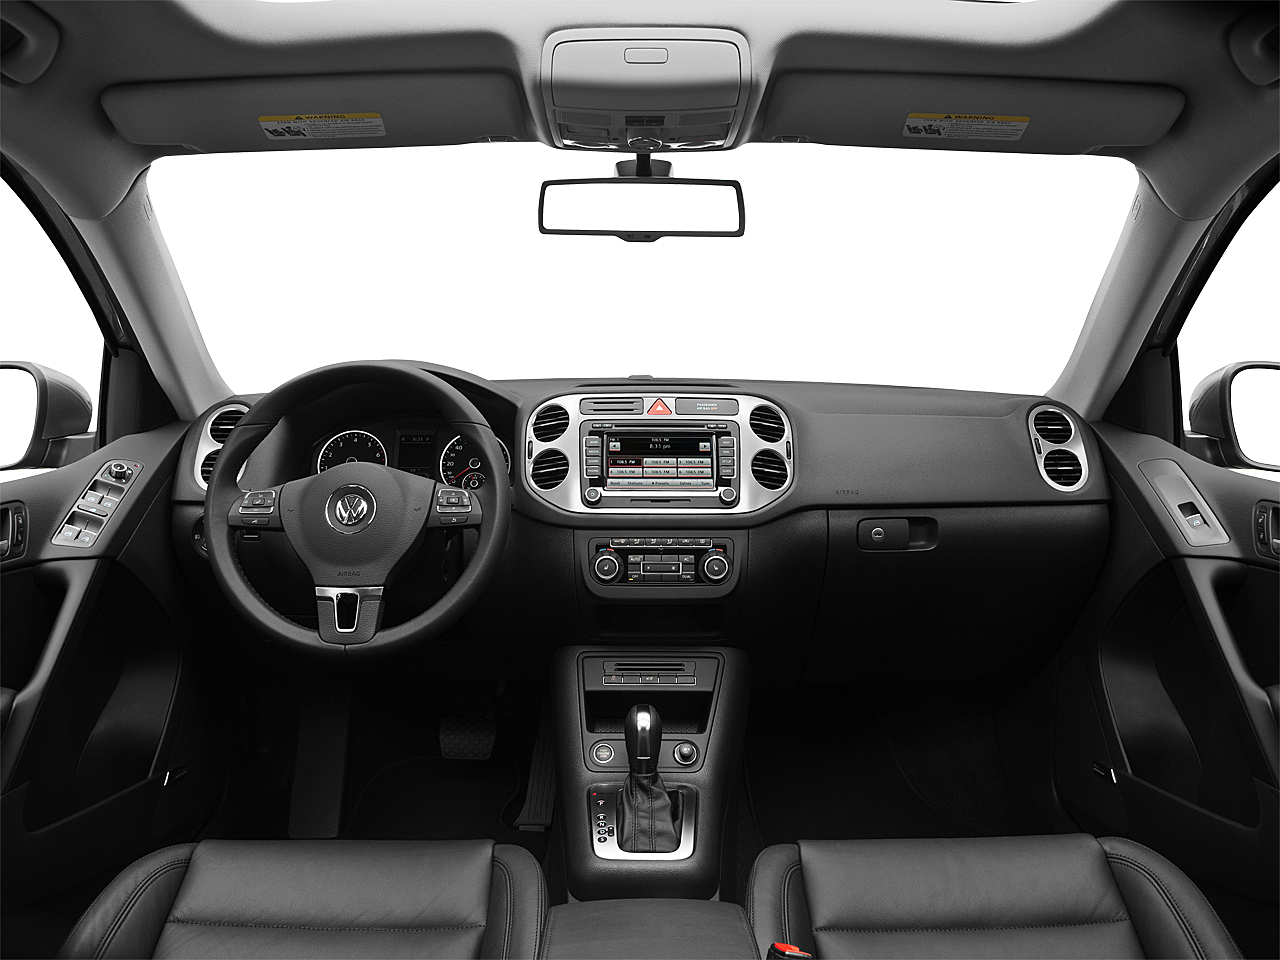 2011 Volkswagen Tiguan Sel 4motion 4dr Suv W Premium Navigation And Fuse Box Centered Wide Dash Shot